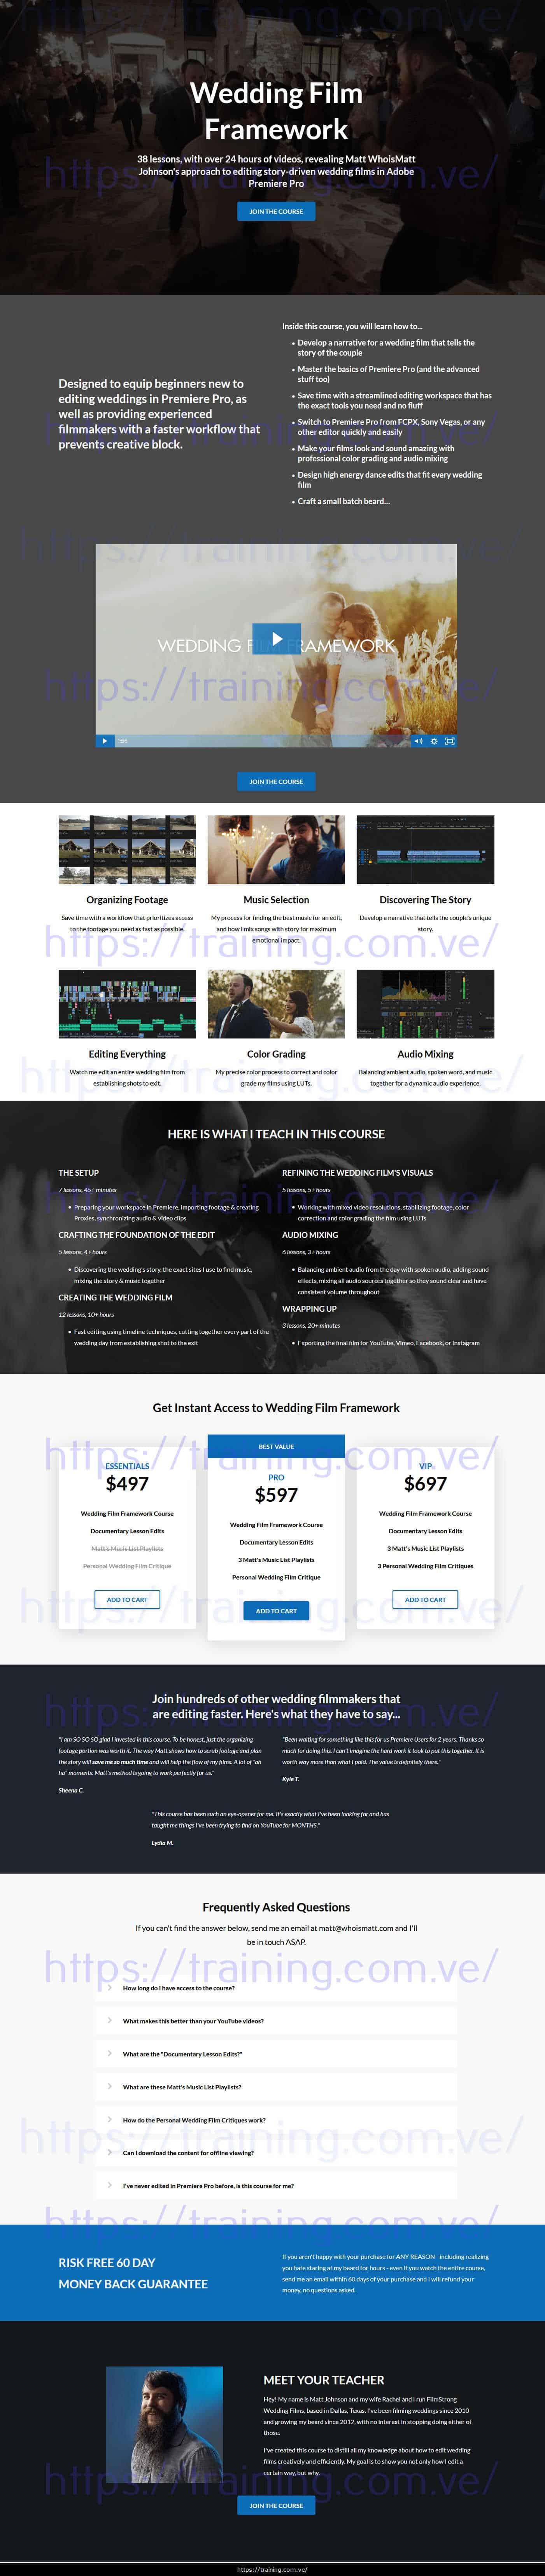 Wedding Film Framework by Matt Johnson sales page